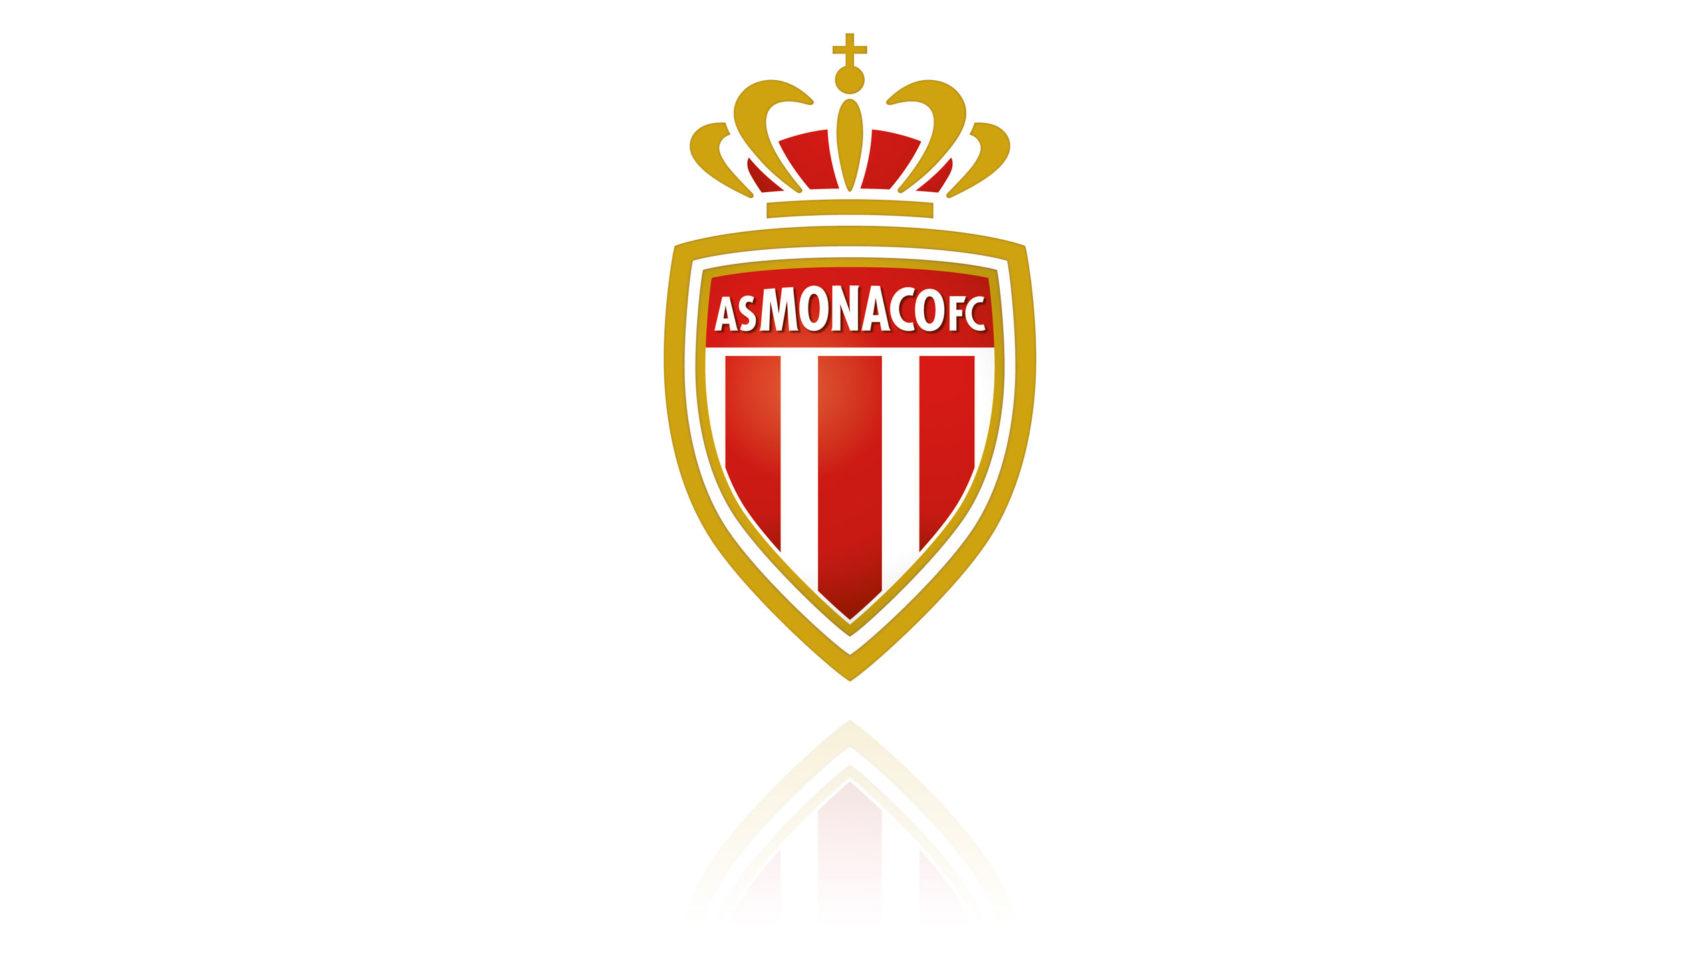 projet_project_realisation_01_AS_Monaco_FC